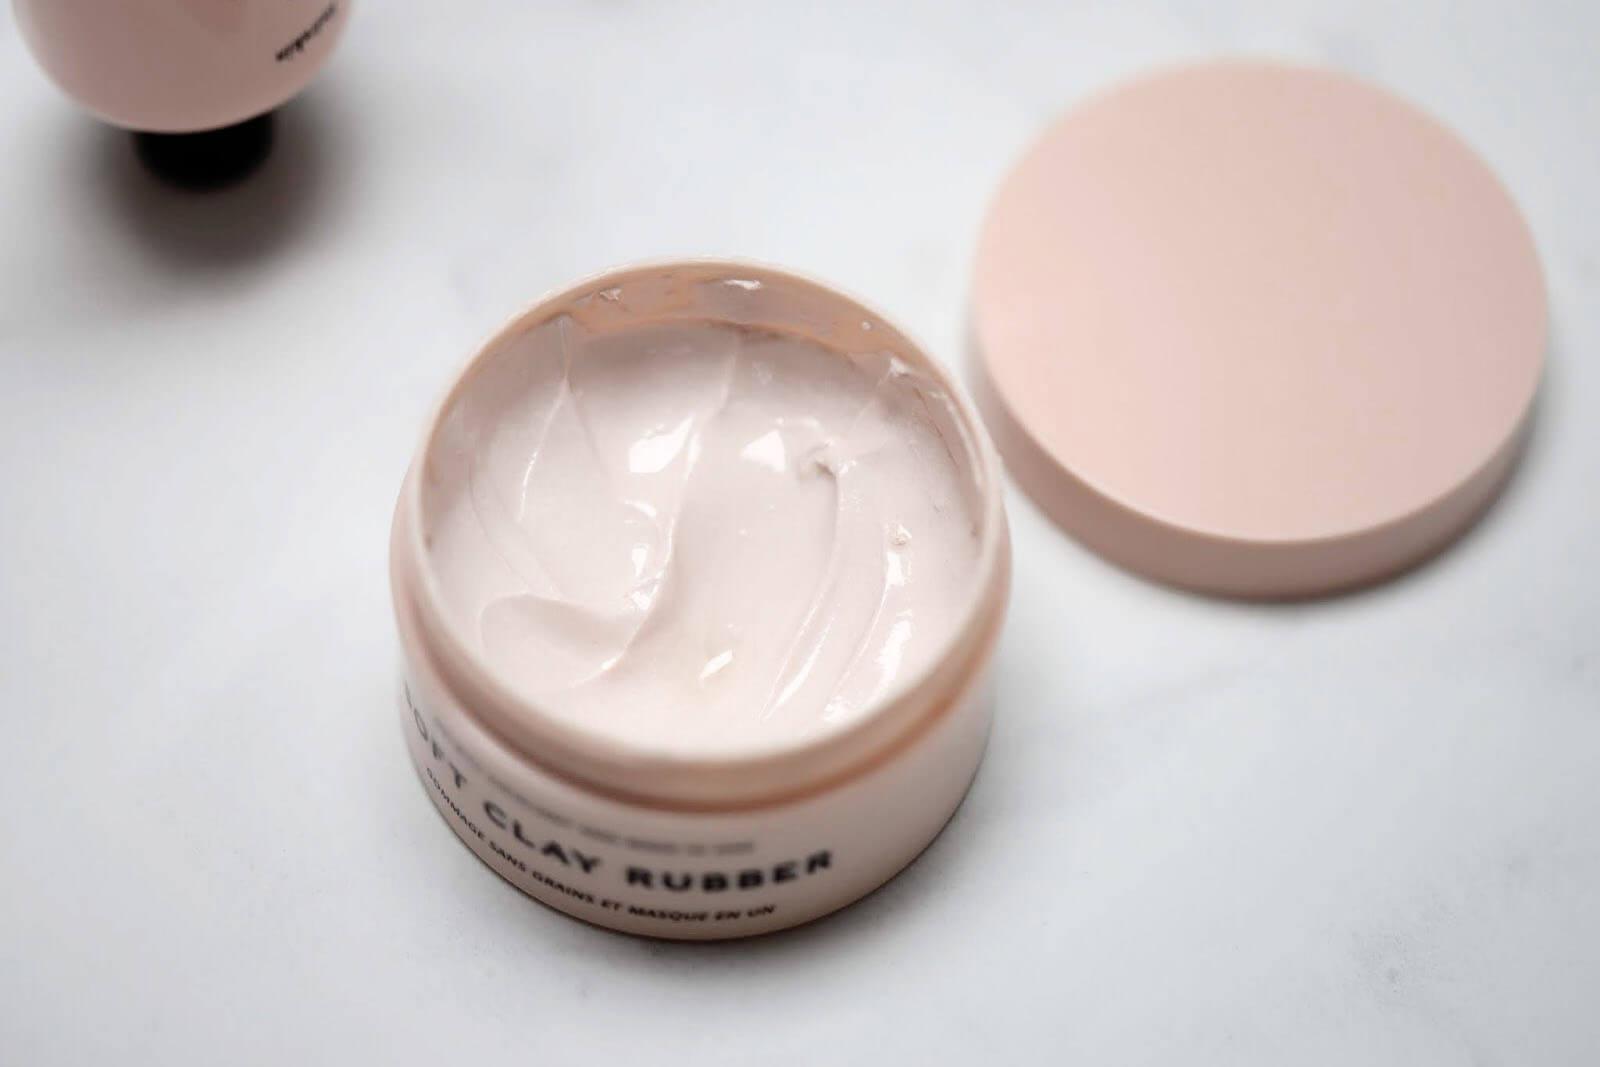 Lixiriskin Soft Clay Rubber Masque Visage Argile revue